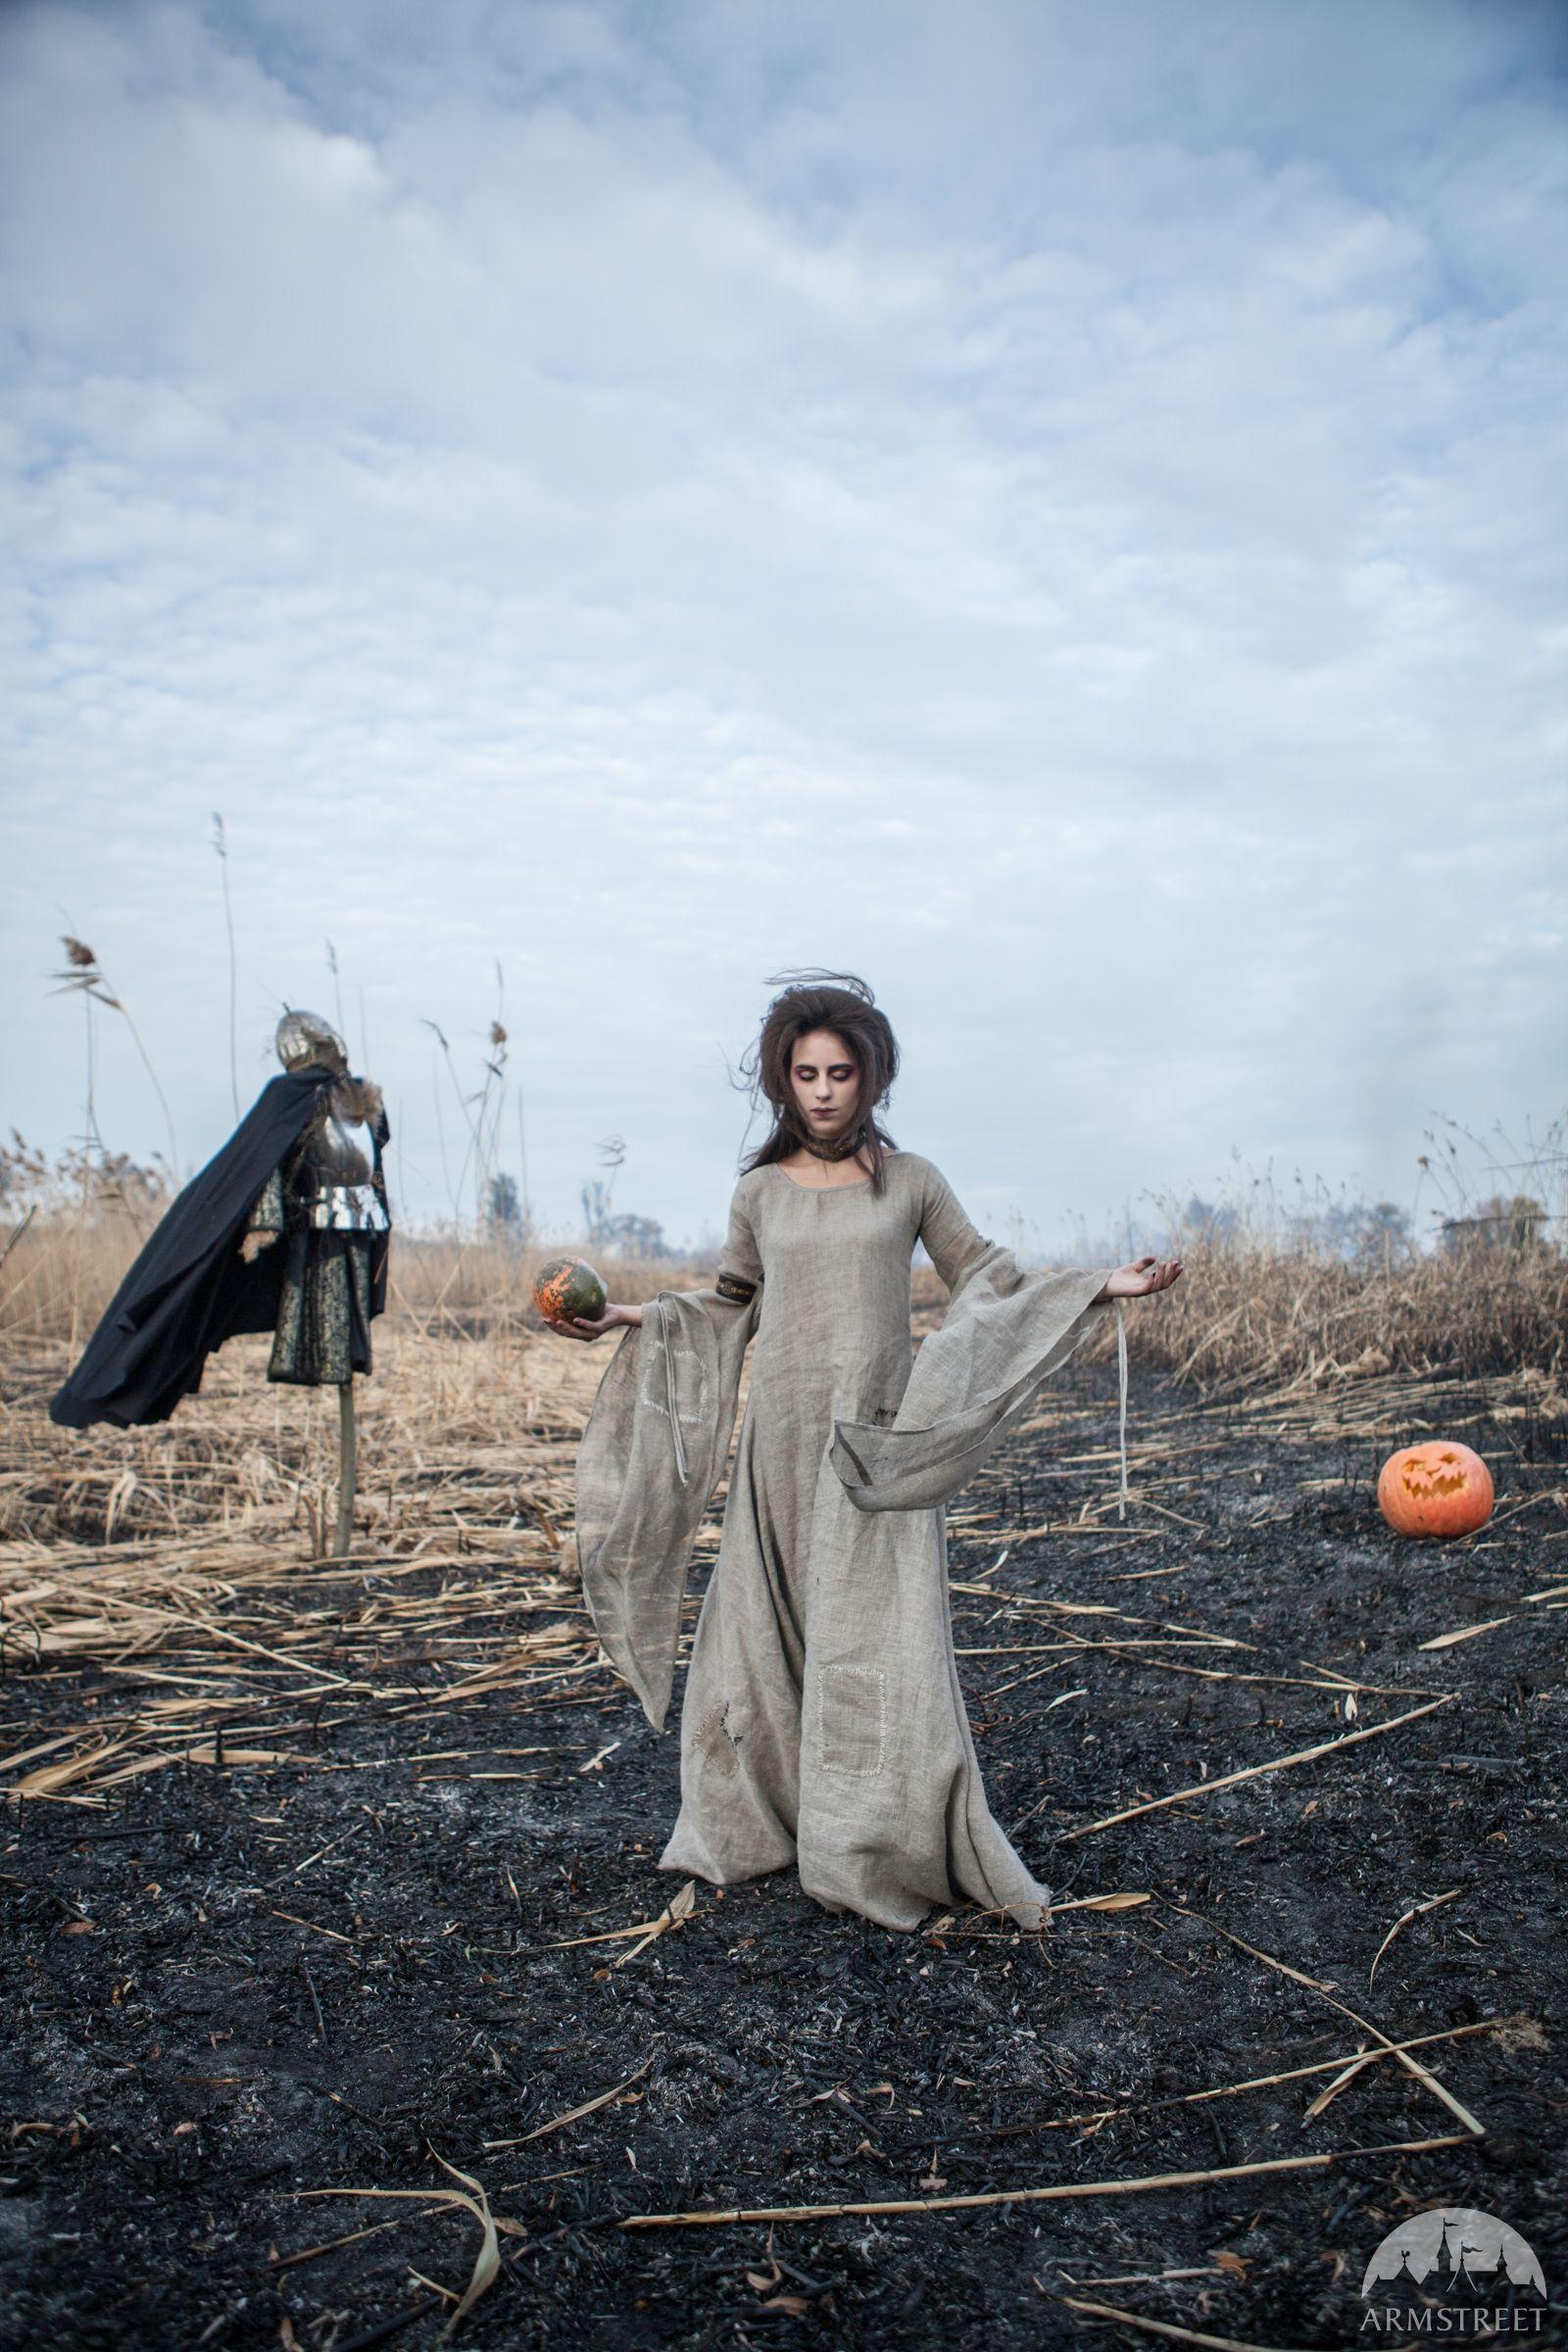 Chemise duhalloween robes fantastiques pinterest halloween